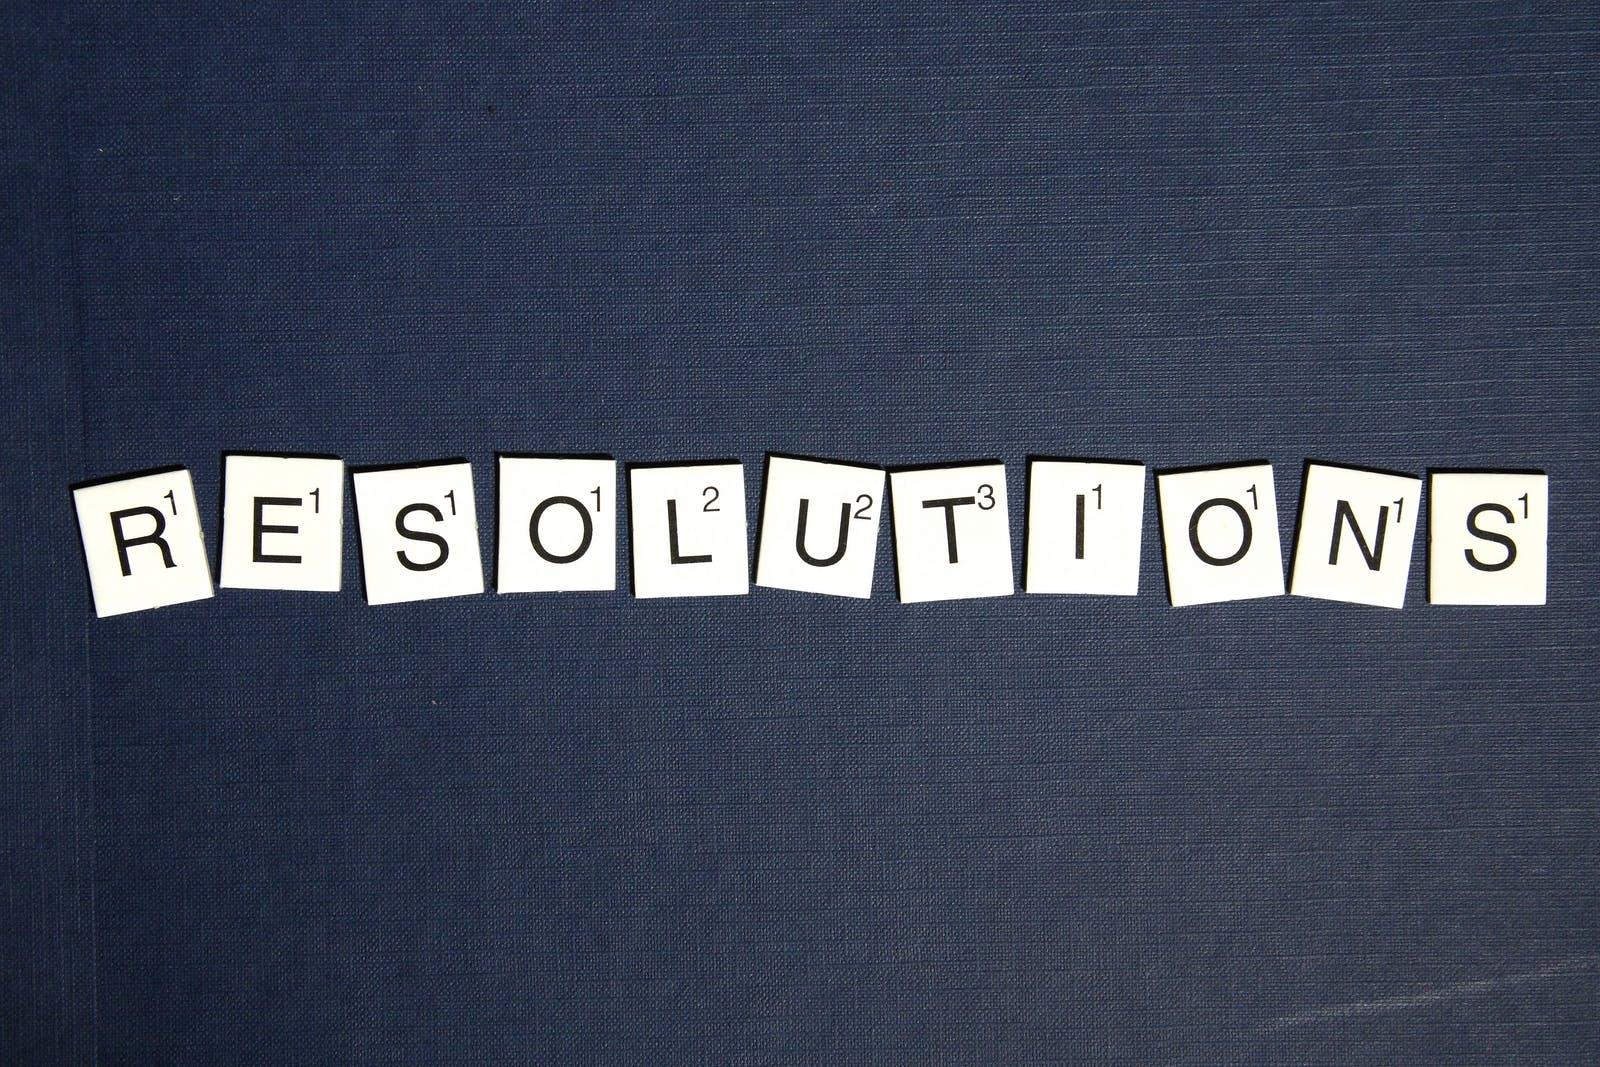 Black and White Scrabble Resolution Illustration